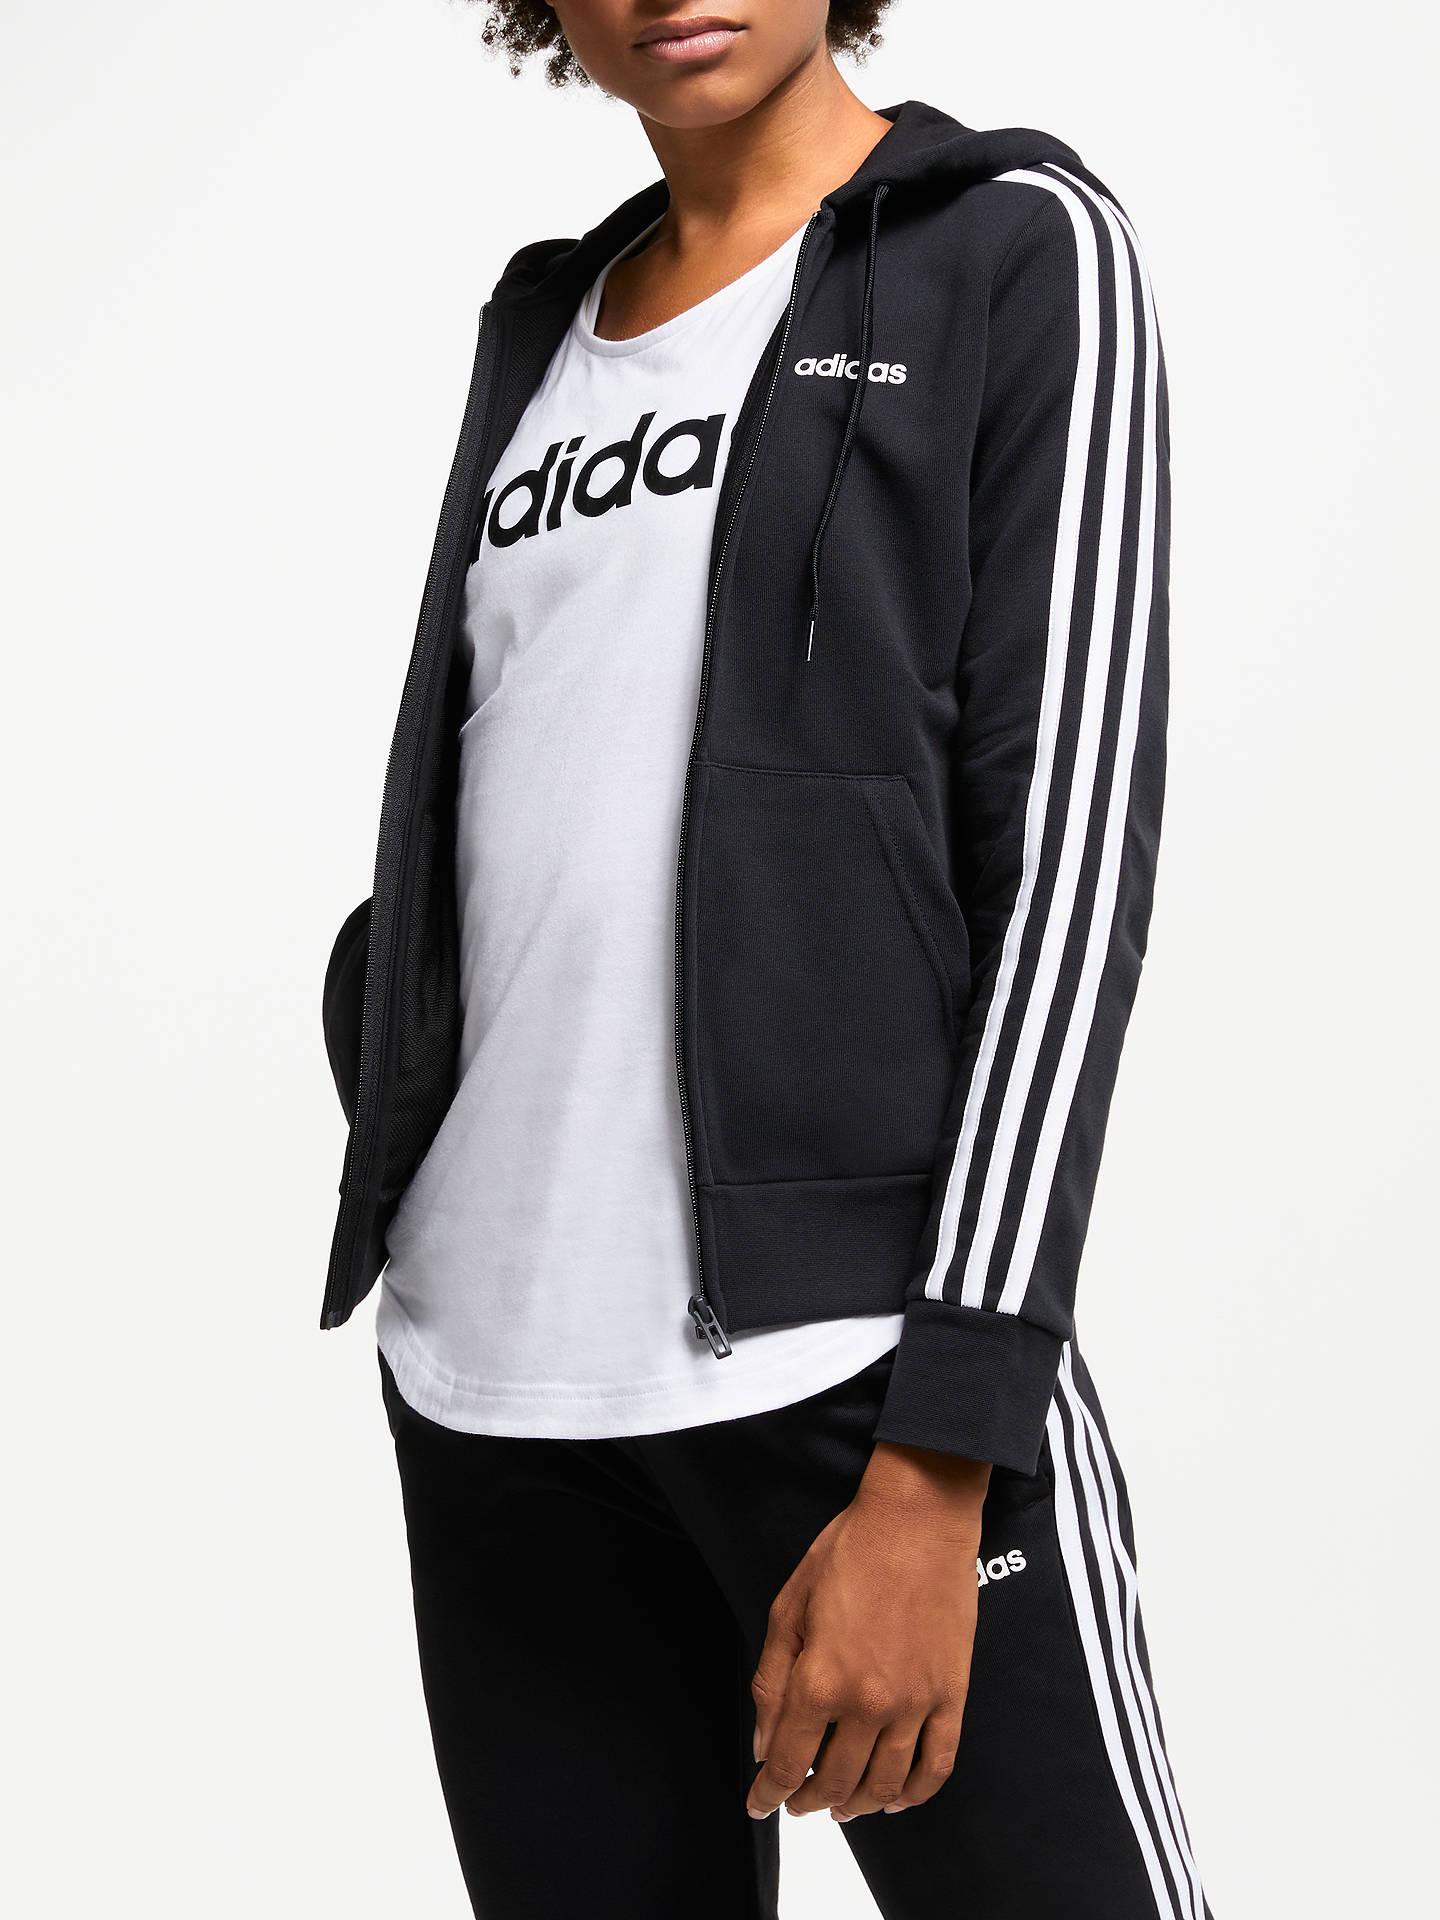 adidas Essentials 3 Stripes Full Zip Training Hoodie, Black